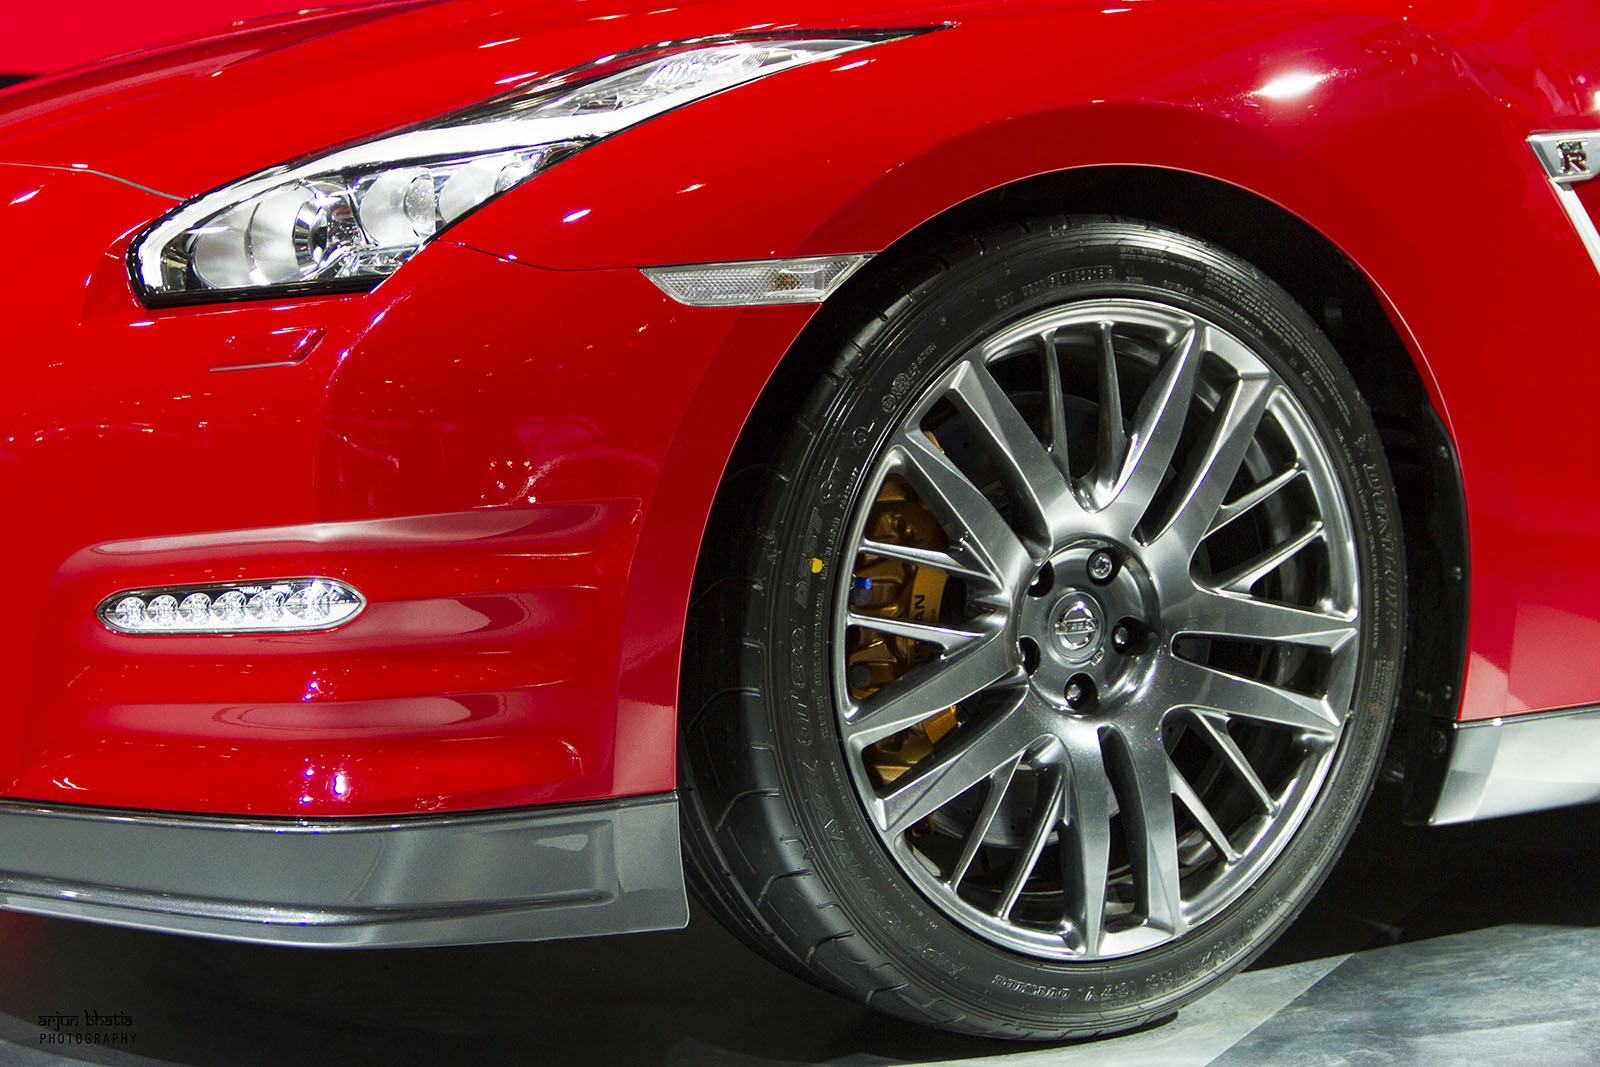 Nissan GT-R Delhi Auto Expo 2016 4